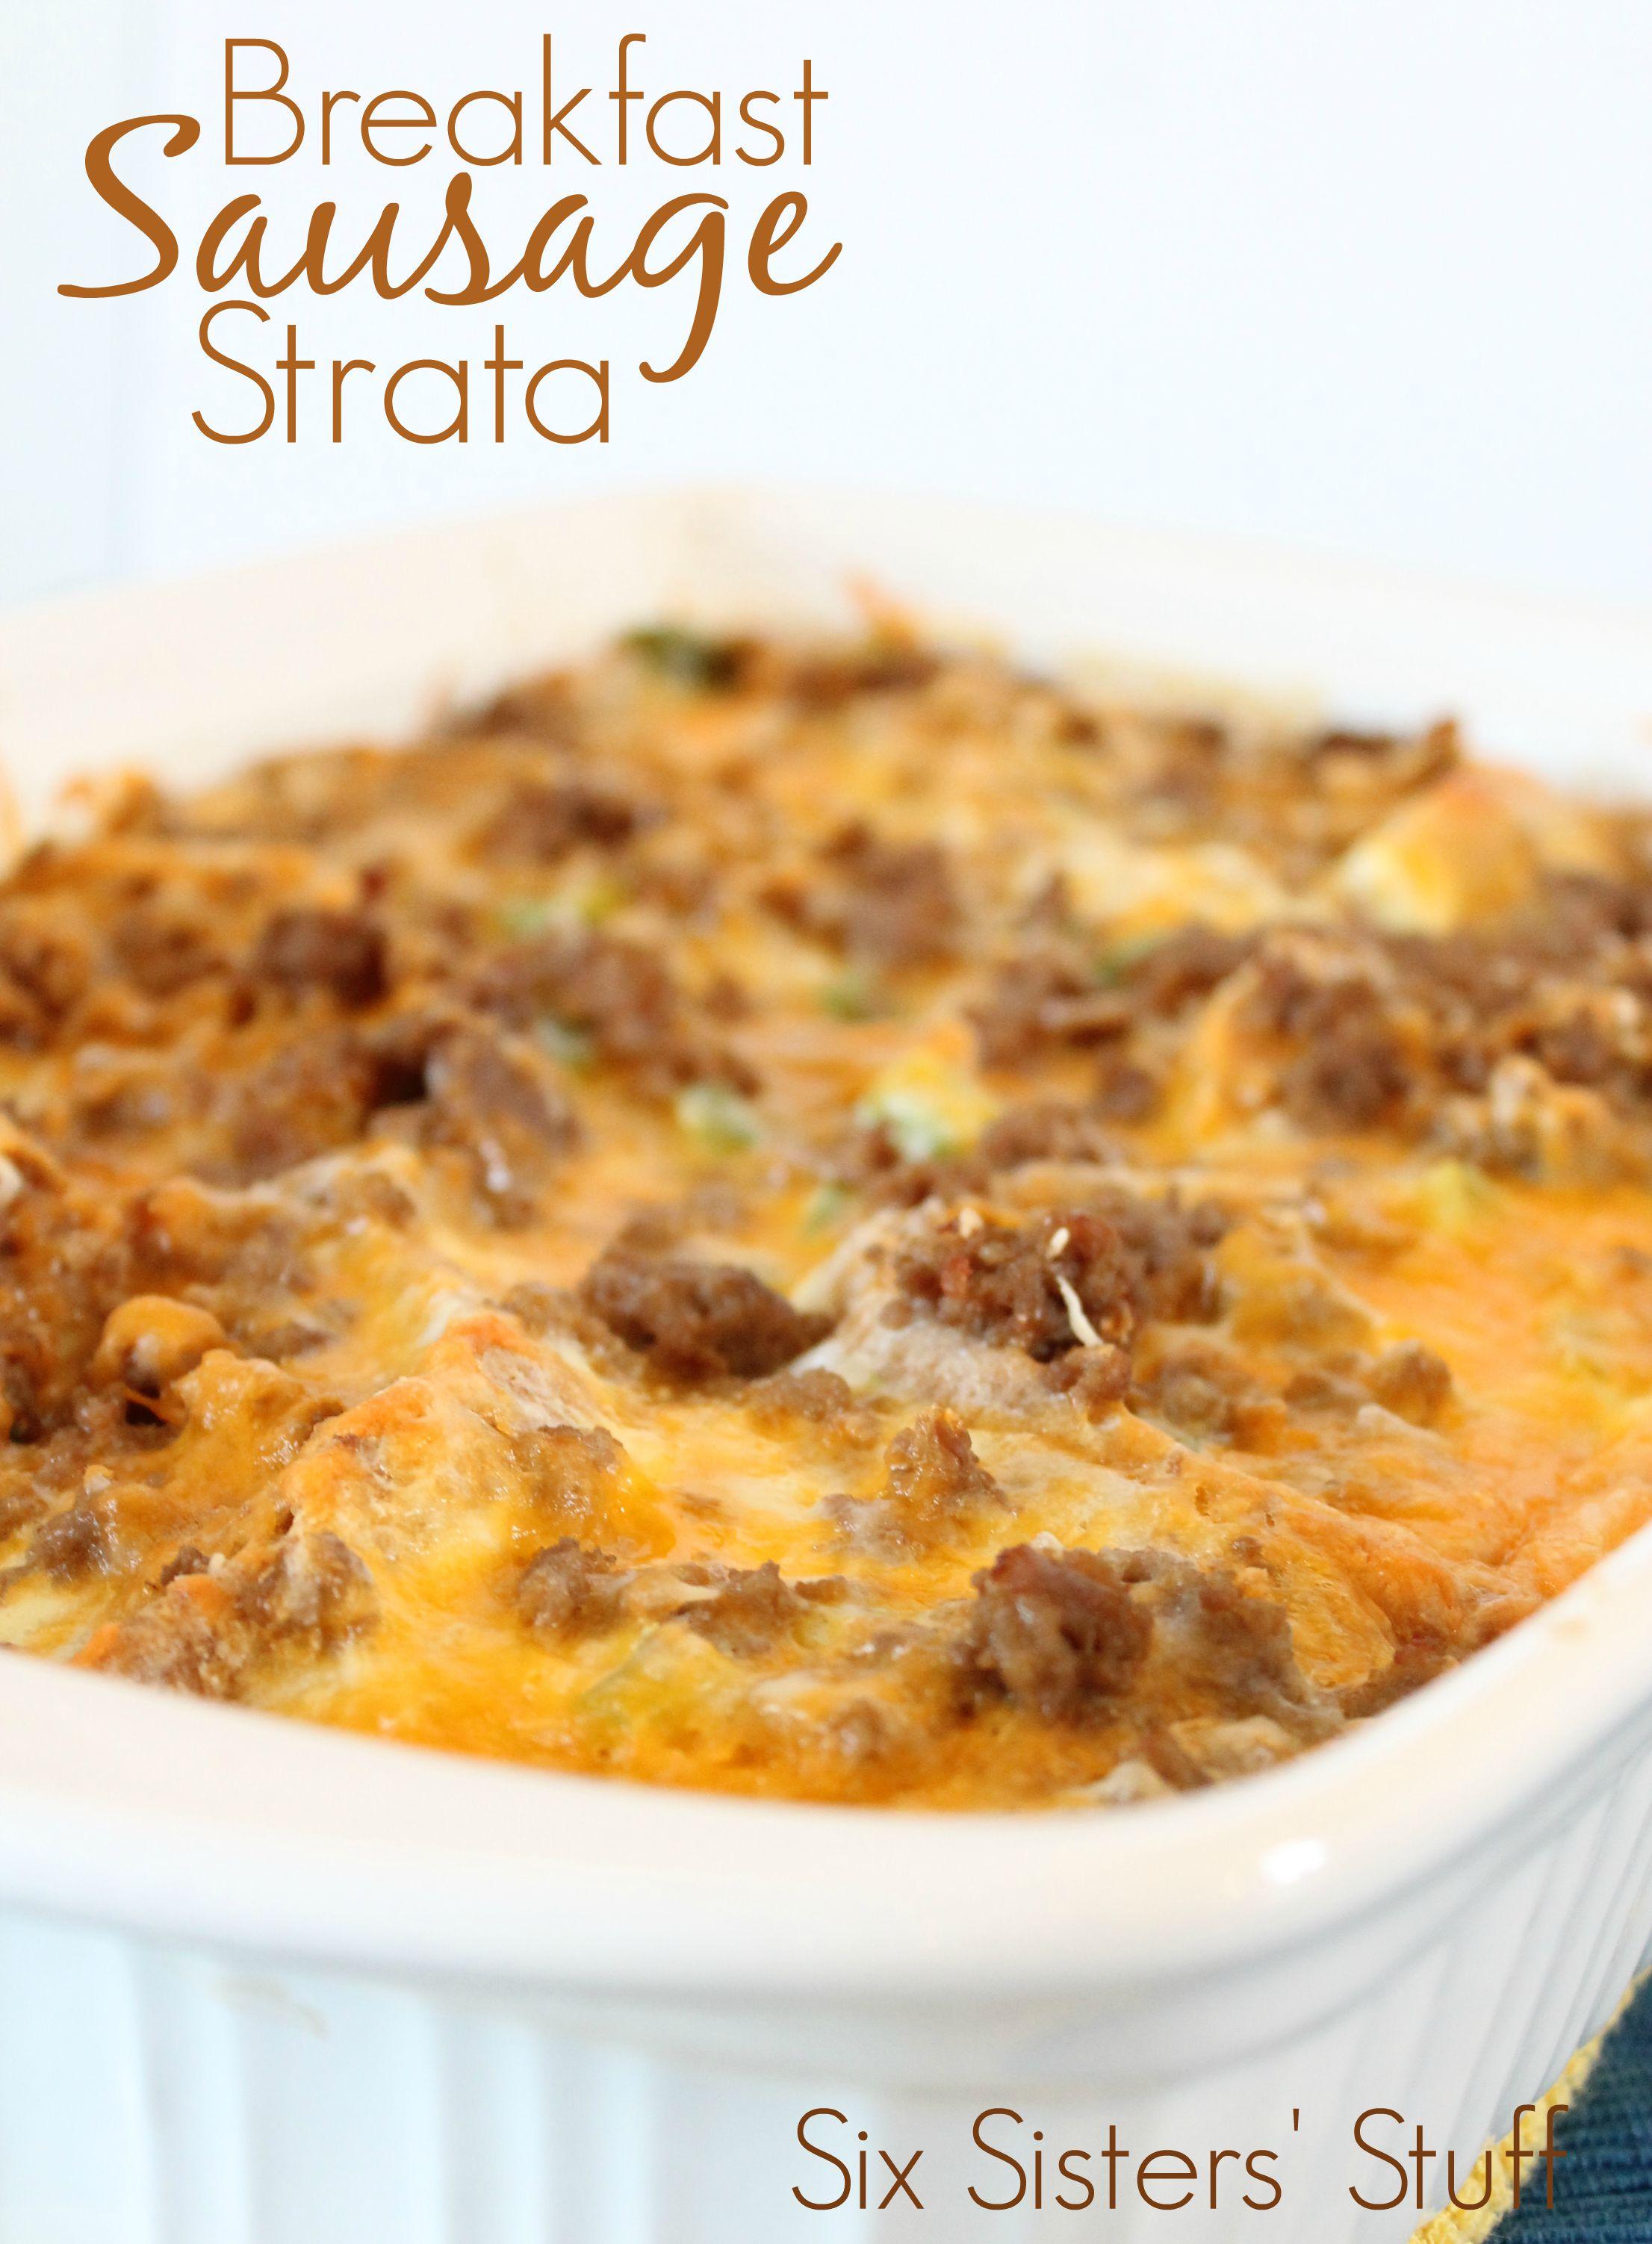 Breakfast Sausage Strata Recipe